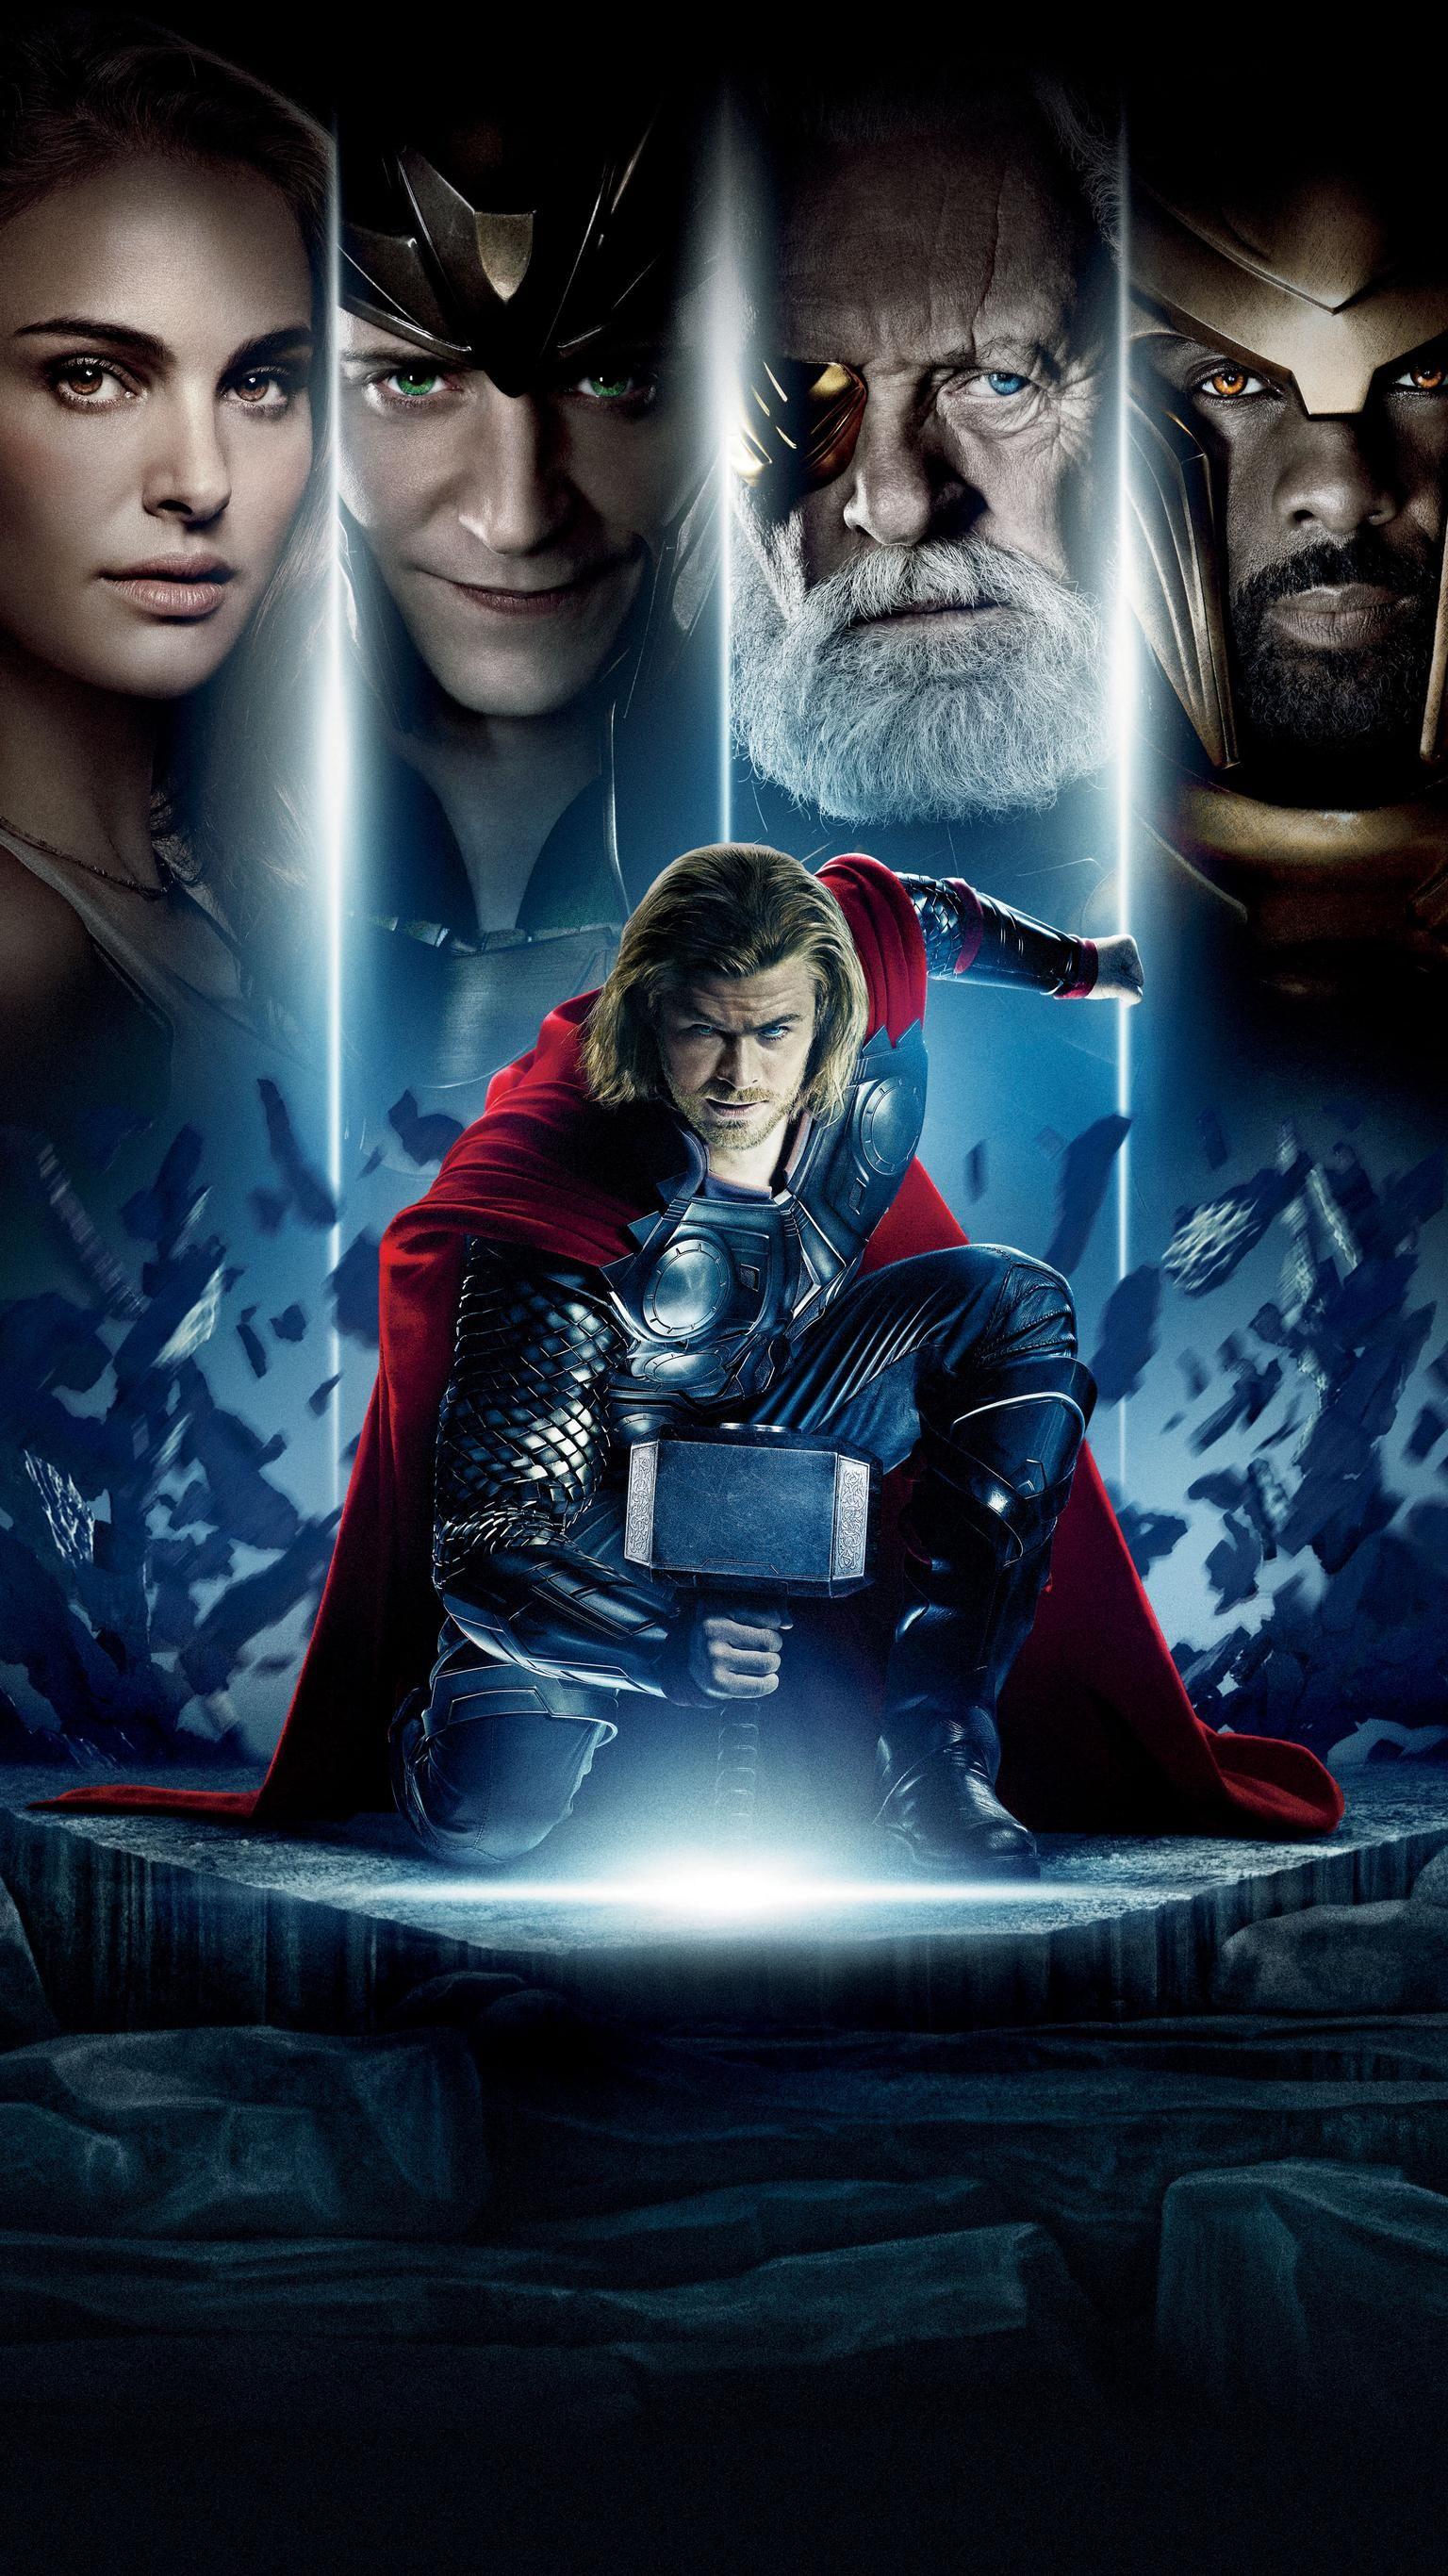 Thor 2011 Phone Wallpaper 映画 ポスター スーパーヒーロー映画